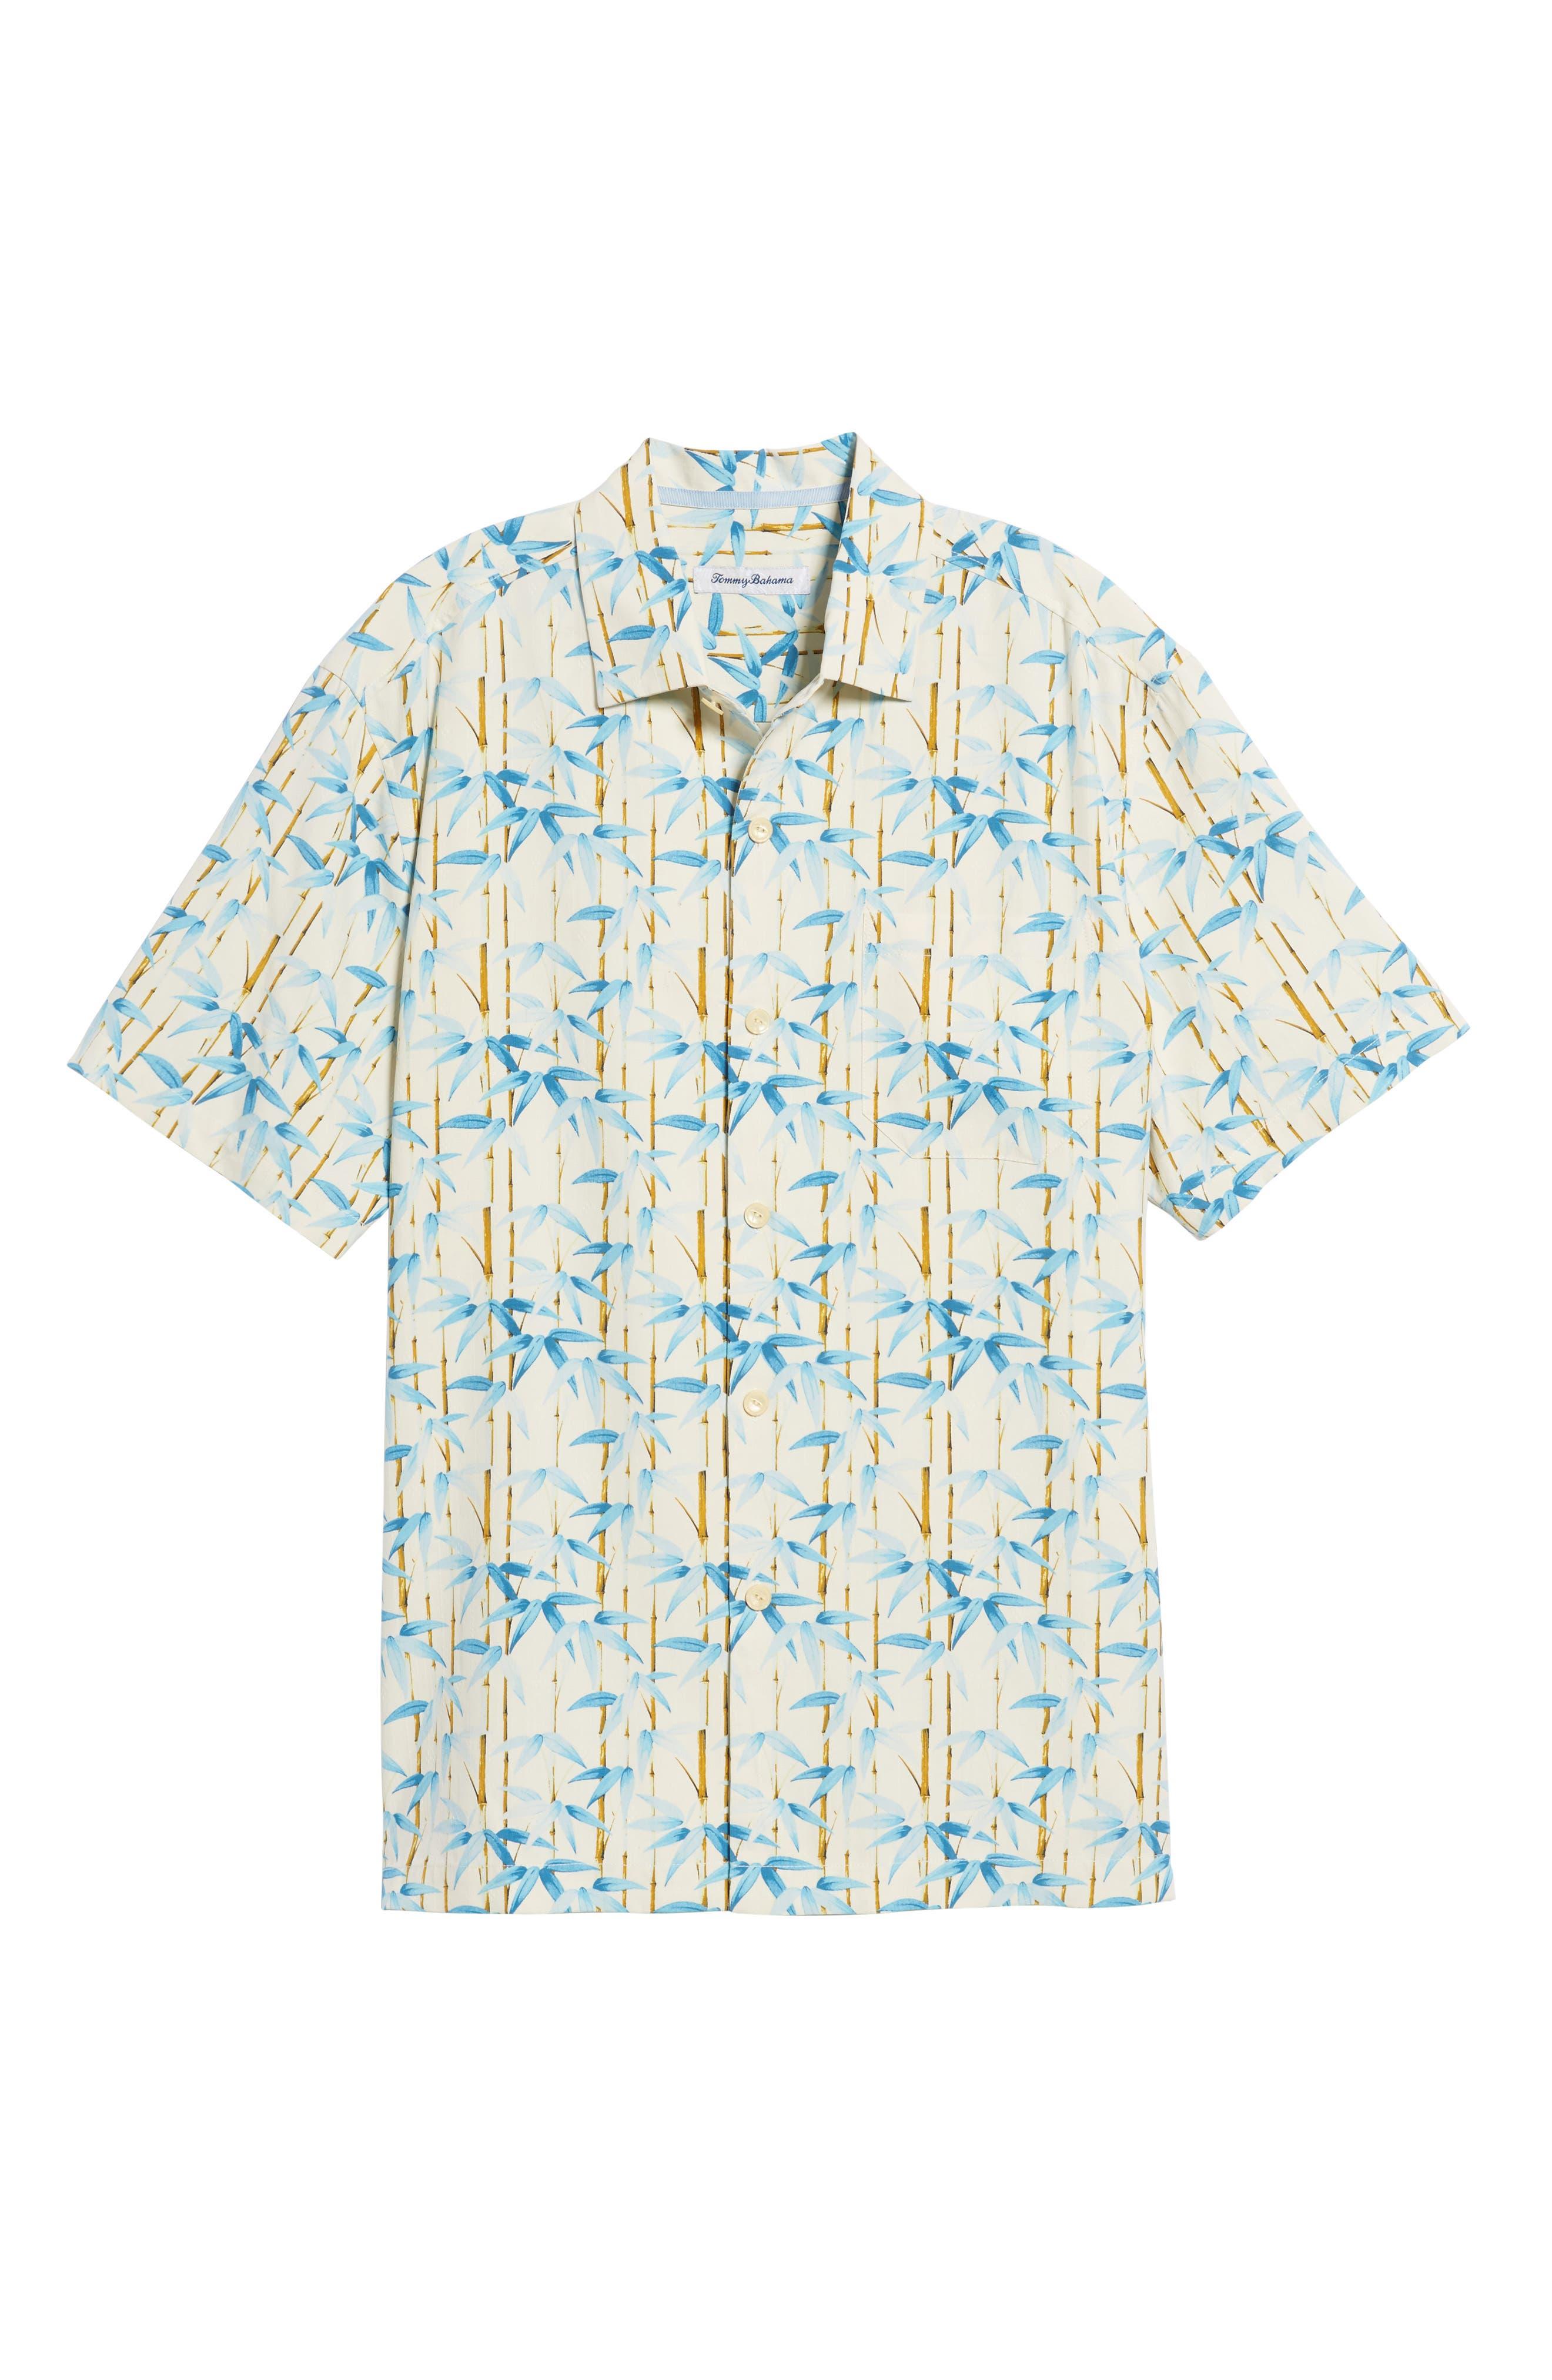 TOMMY BAHAMA,                             Forest Print Silk Sport Shirt,                             Alternate thumbnail 6, color,                             100